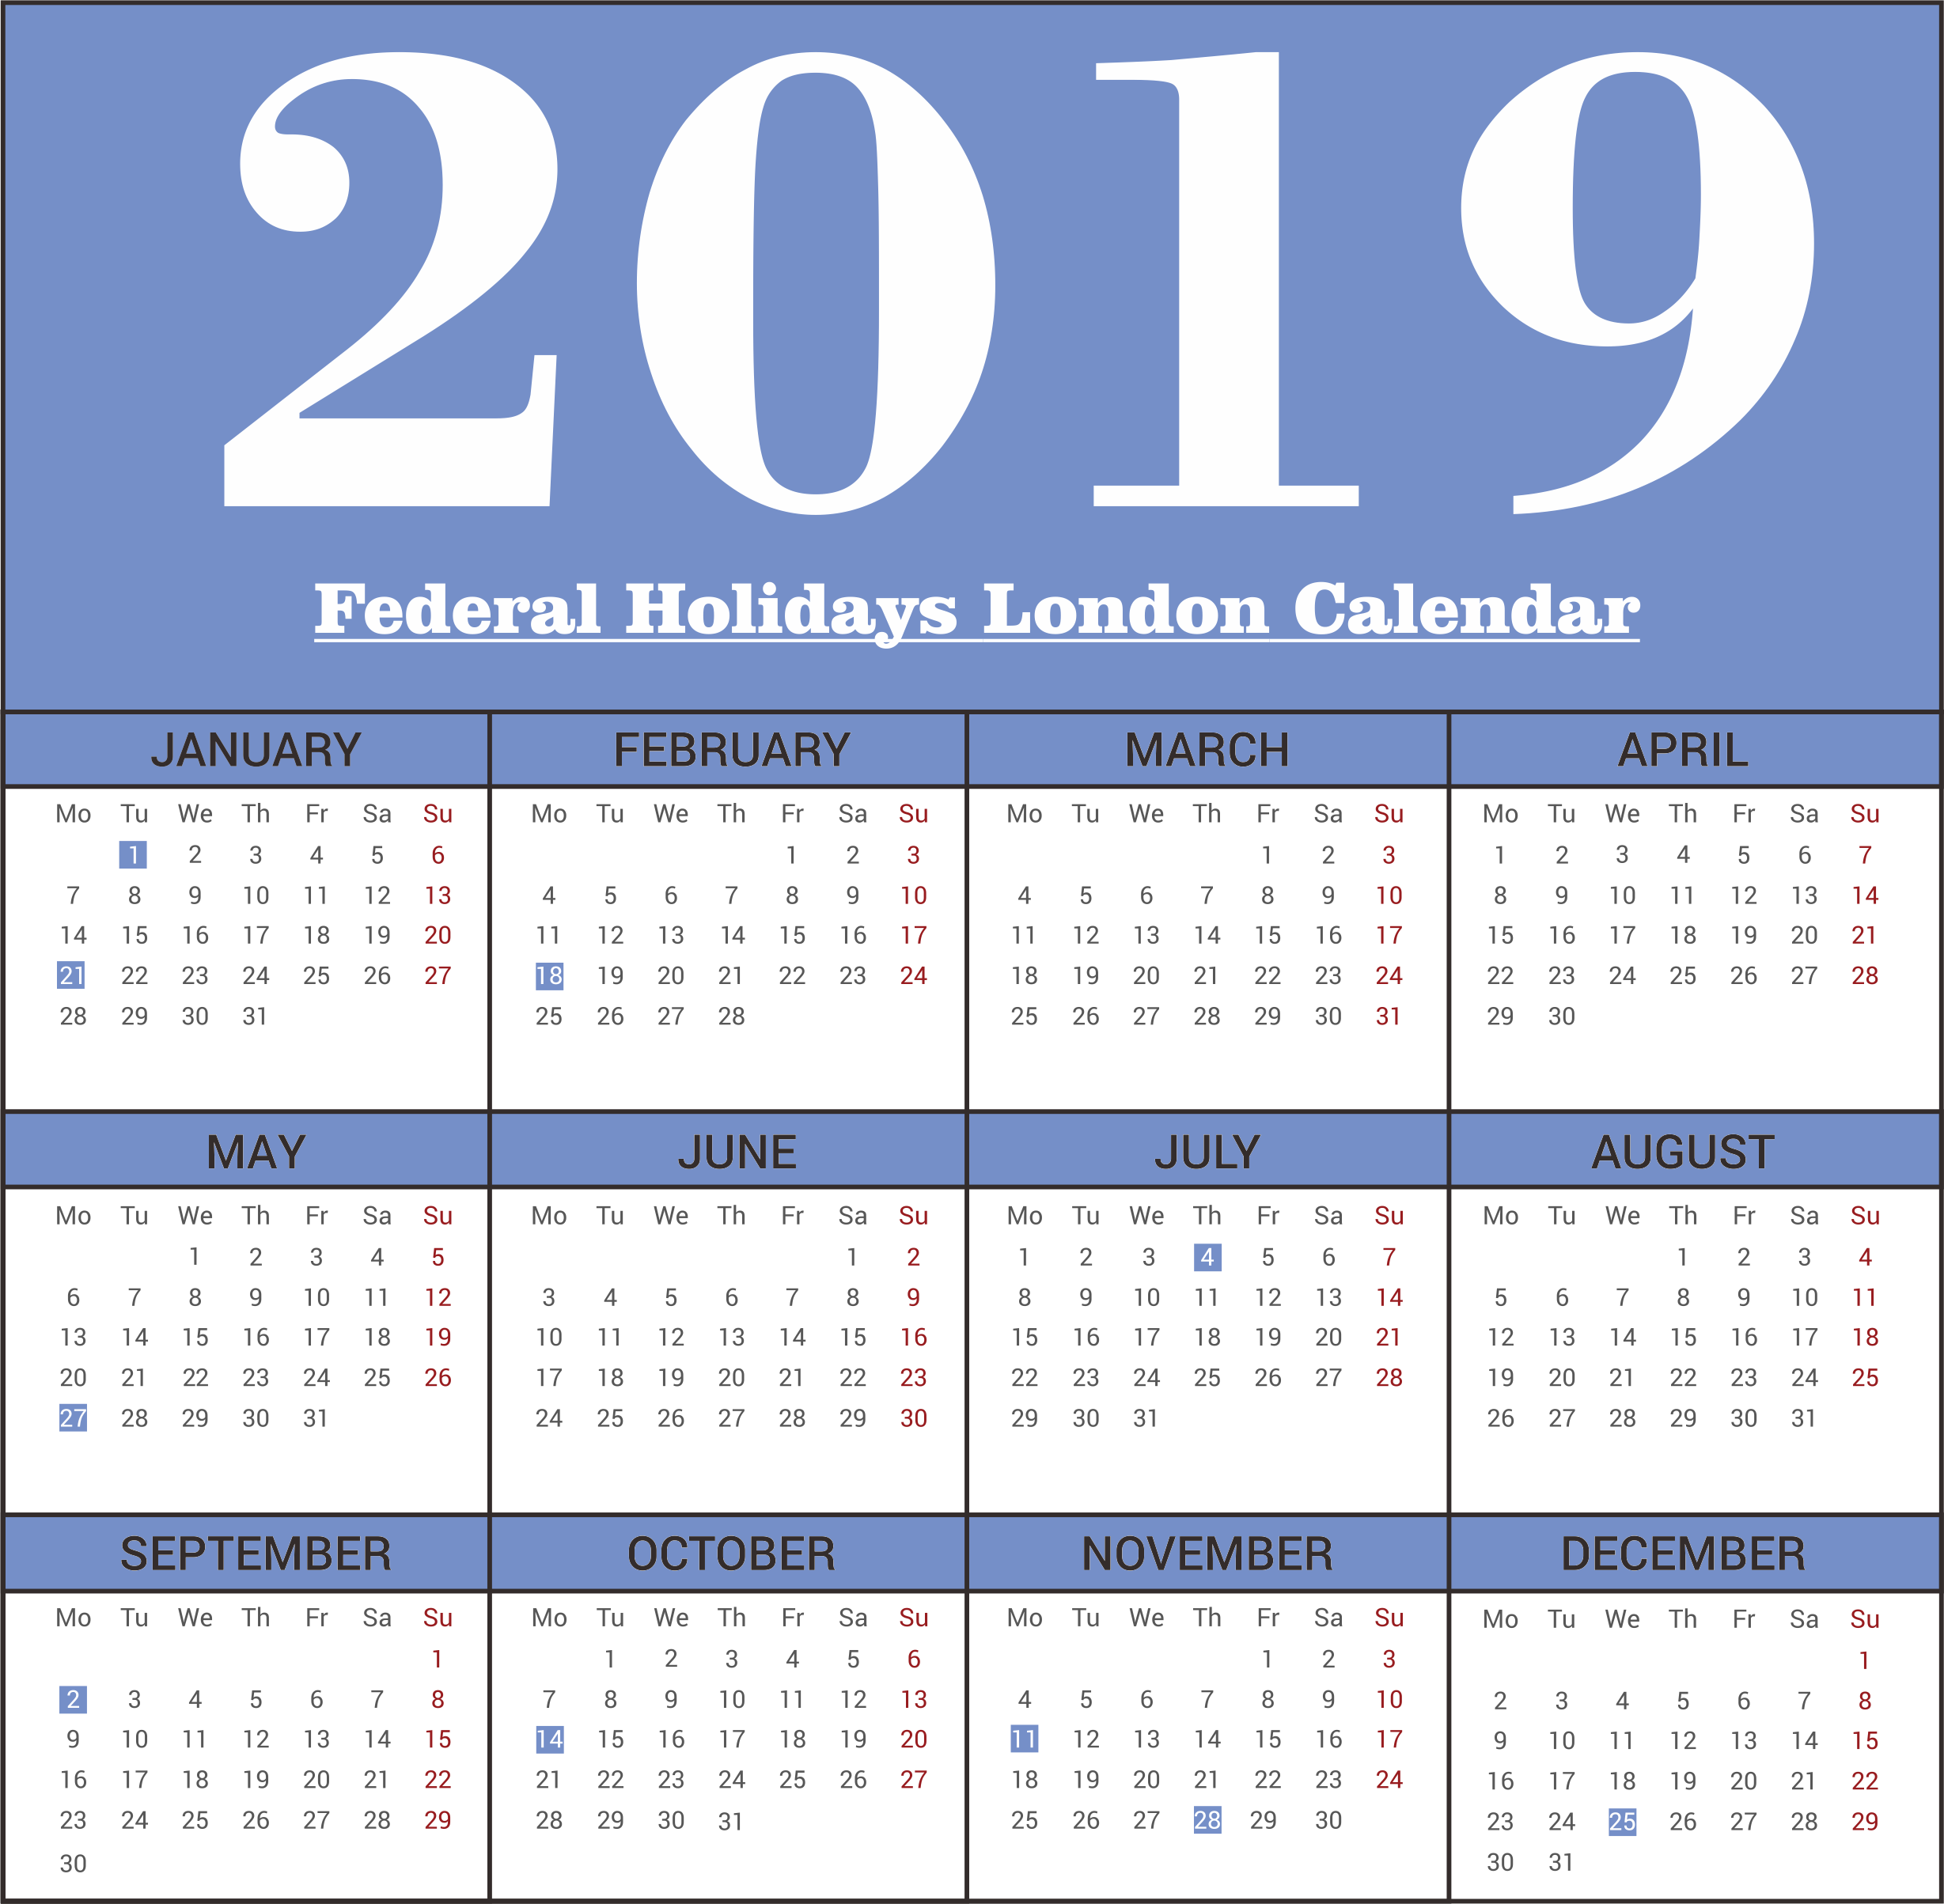 2019 London Federal Holidays Calendar